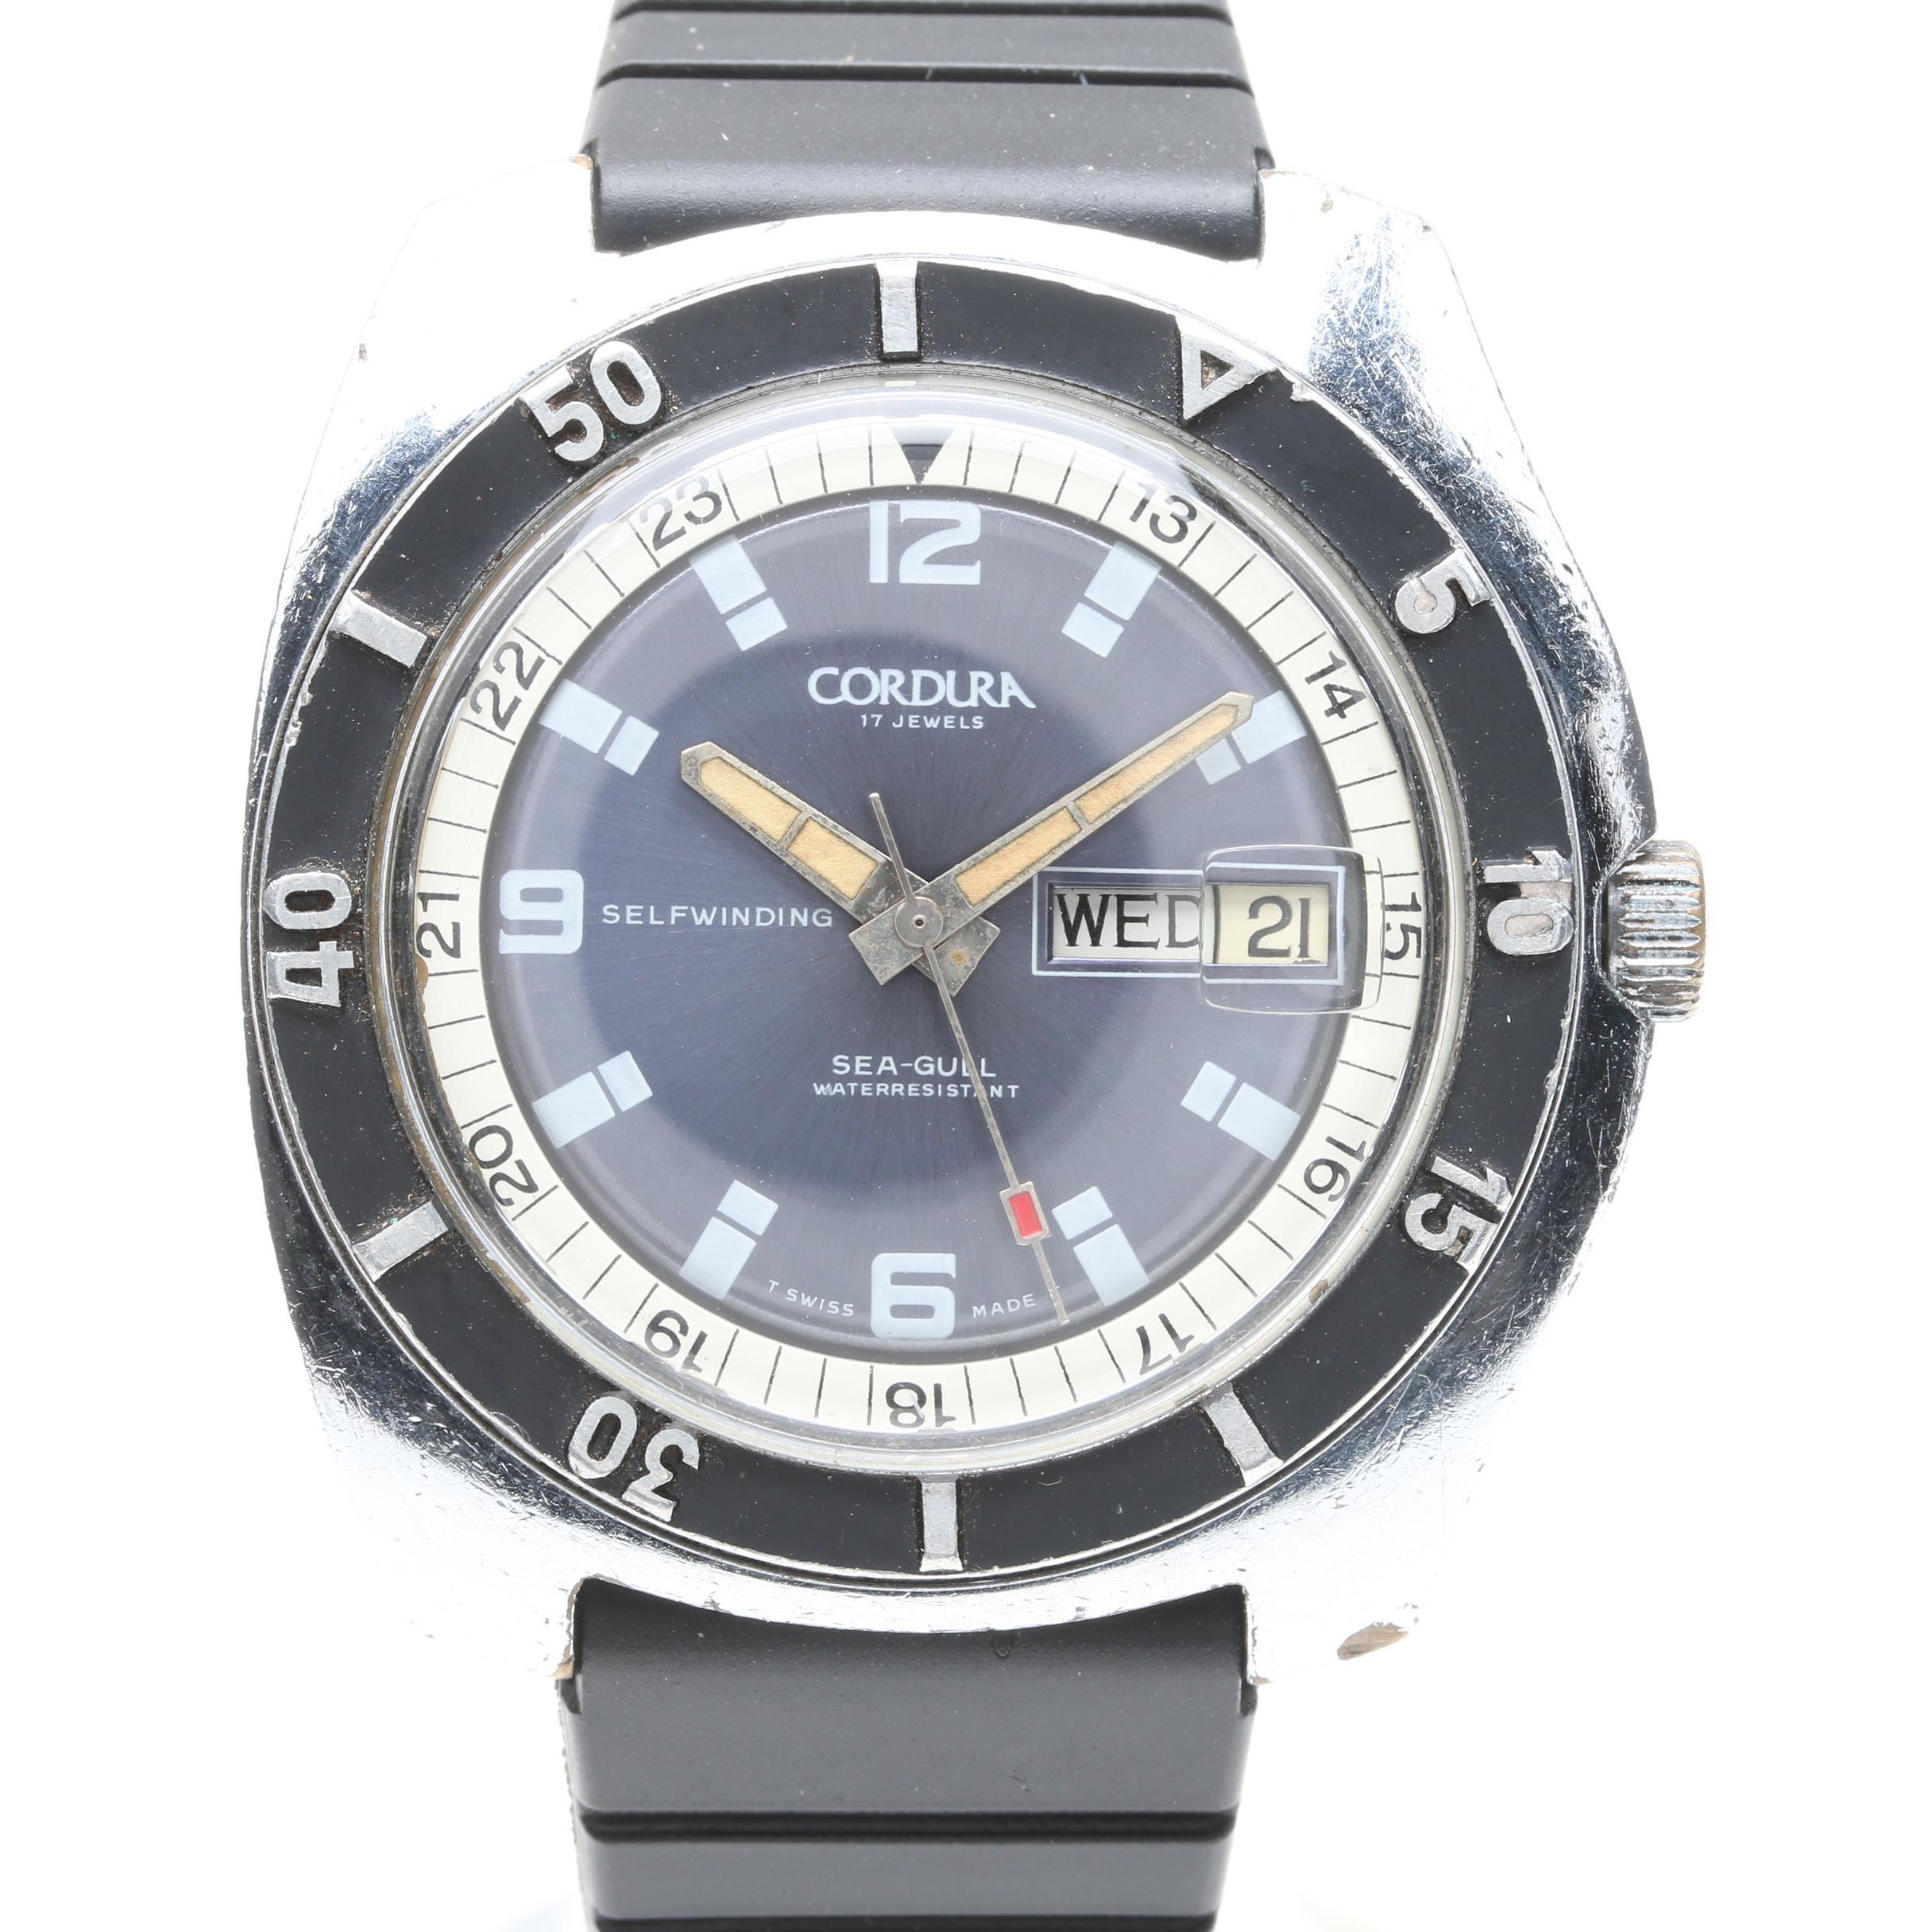 Vintage Cordura Sea-Gull Diver Wristwatch